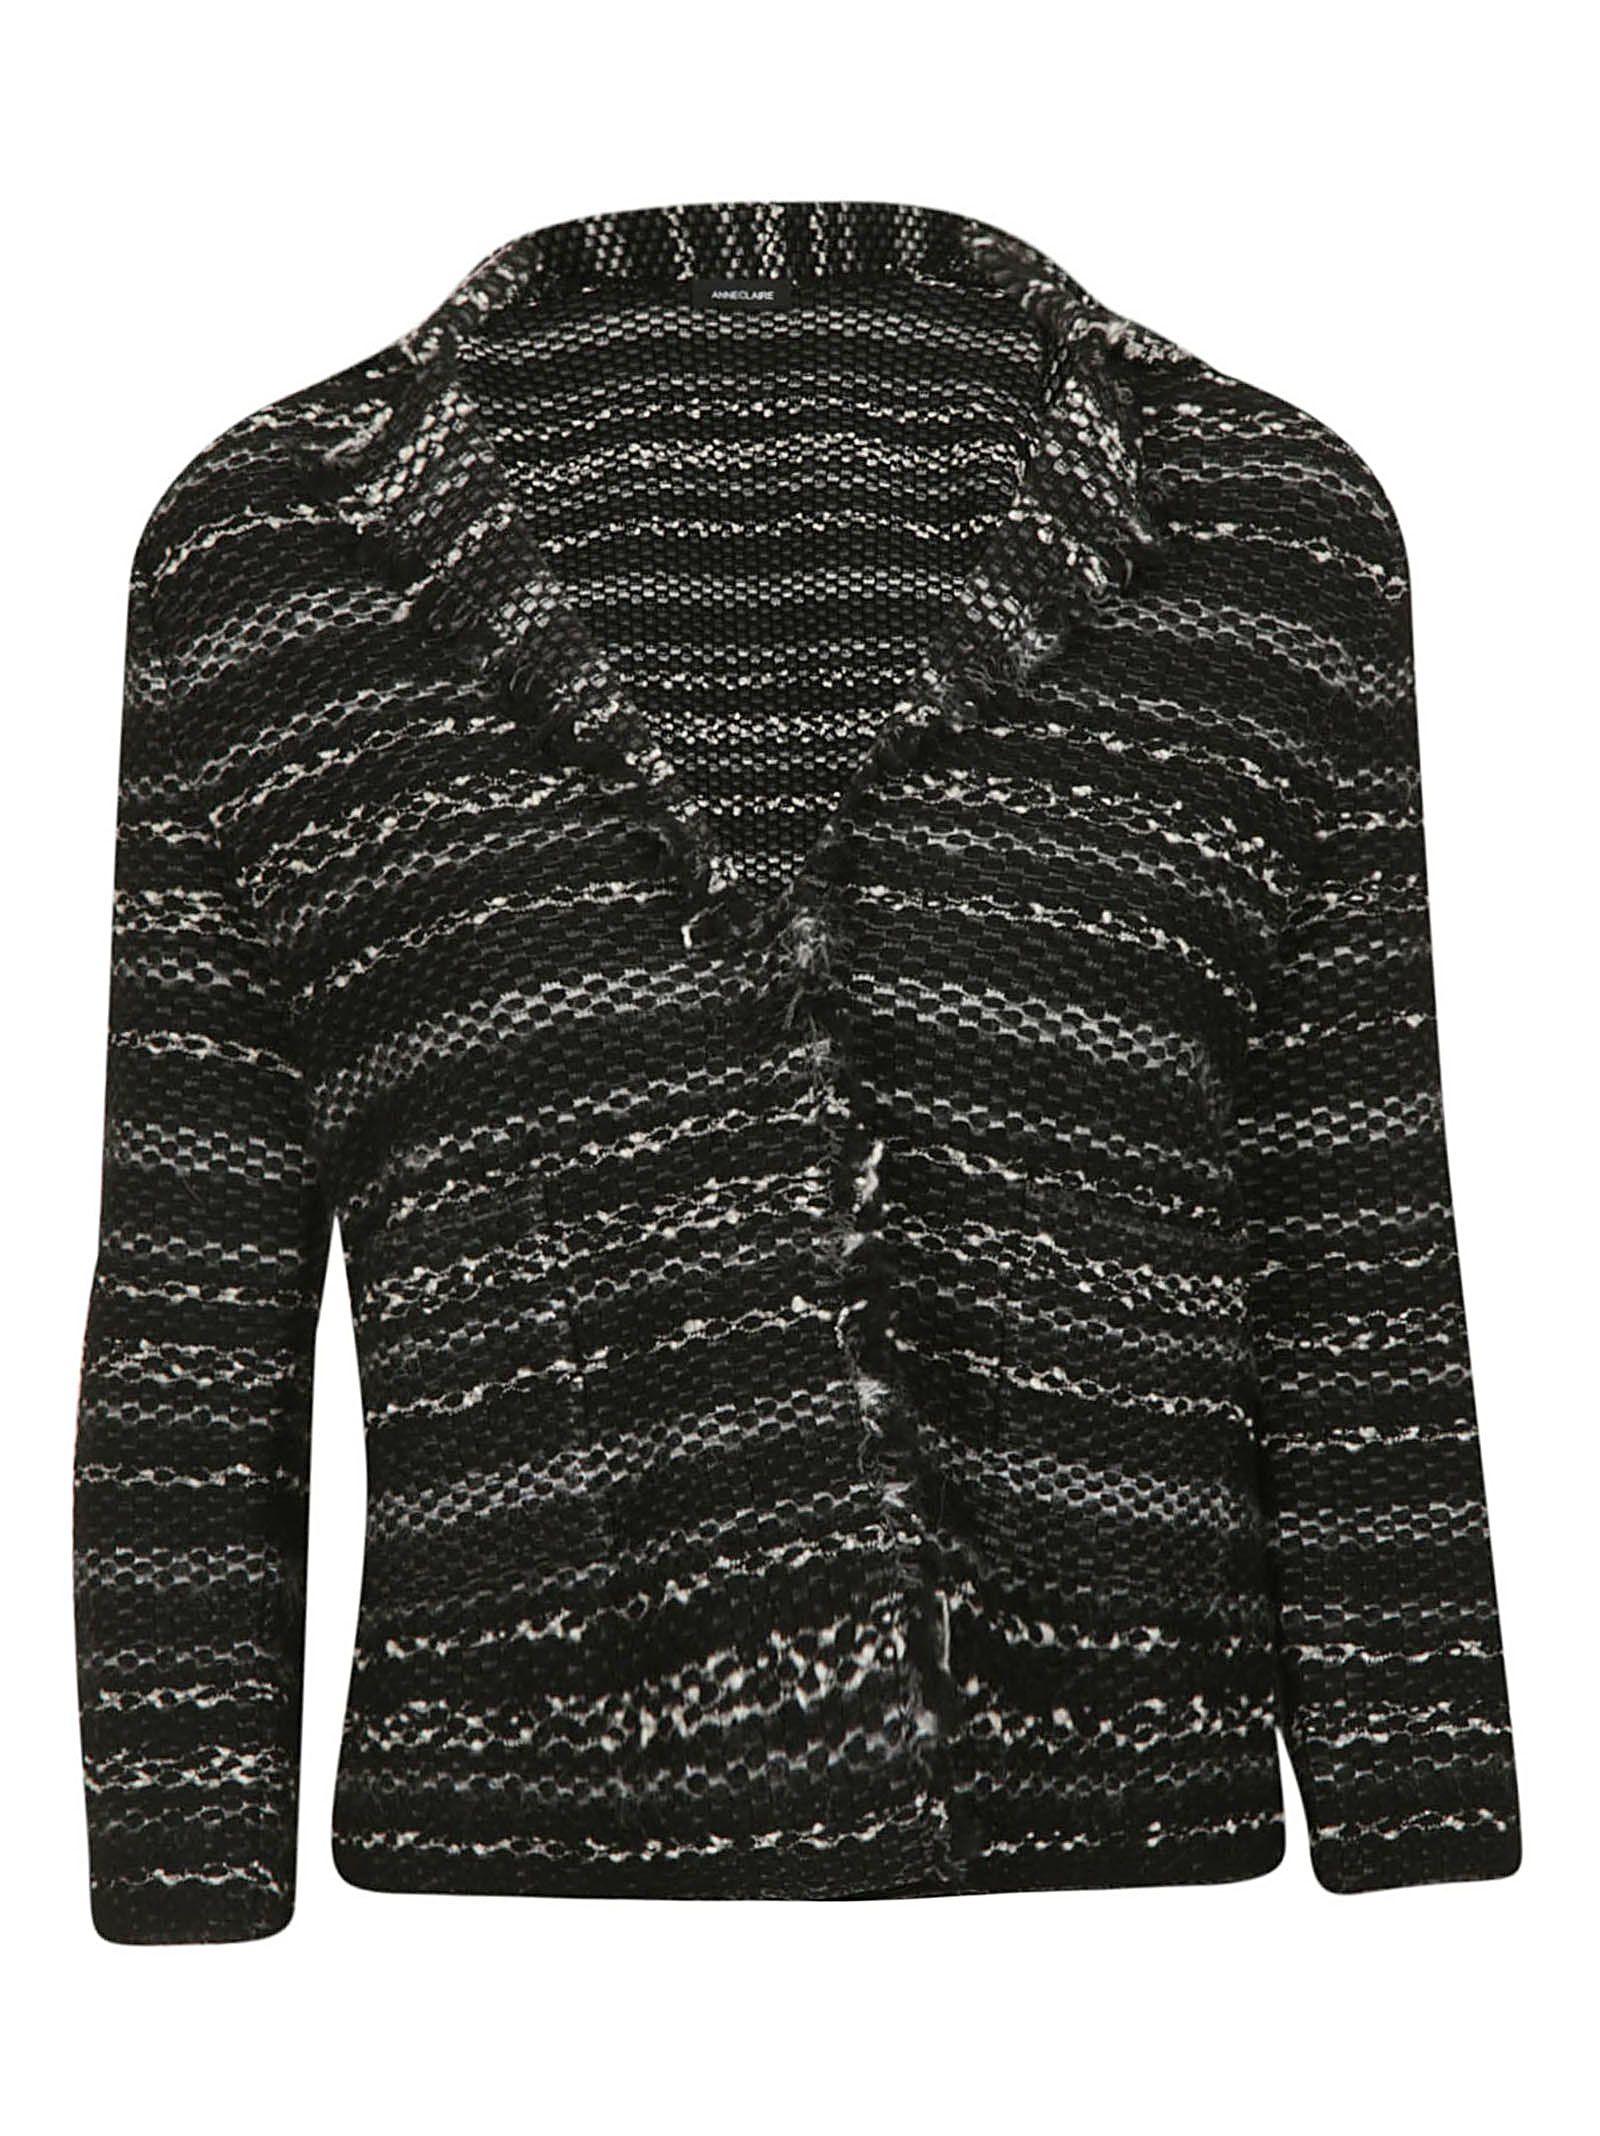 ANNECLAIRE Striped Sweater in Black